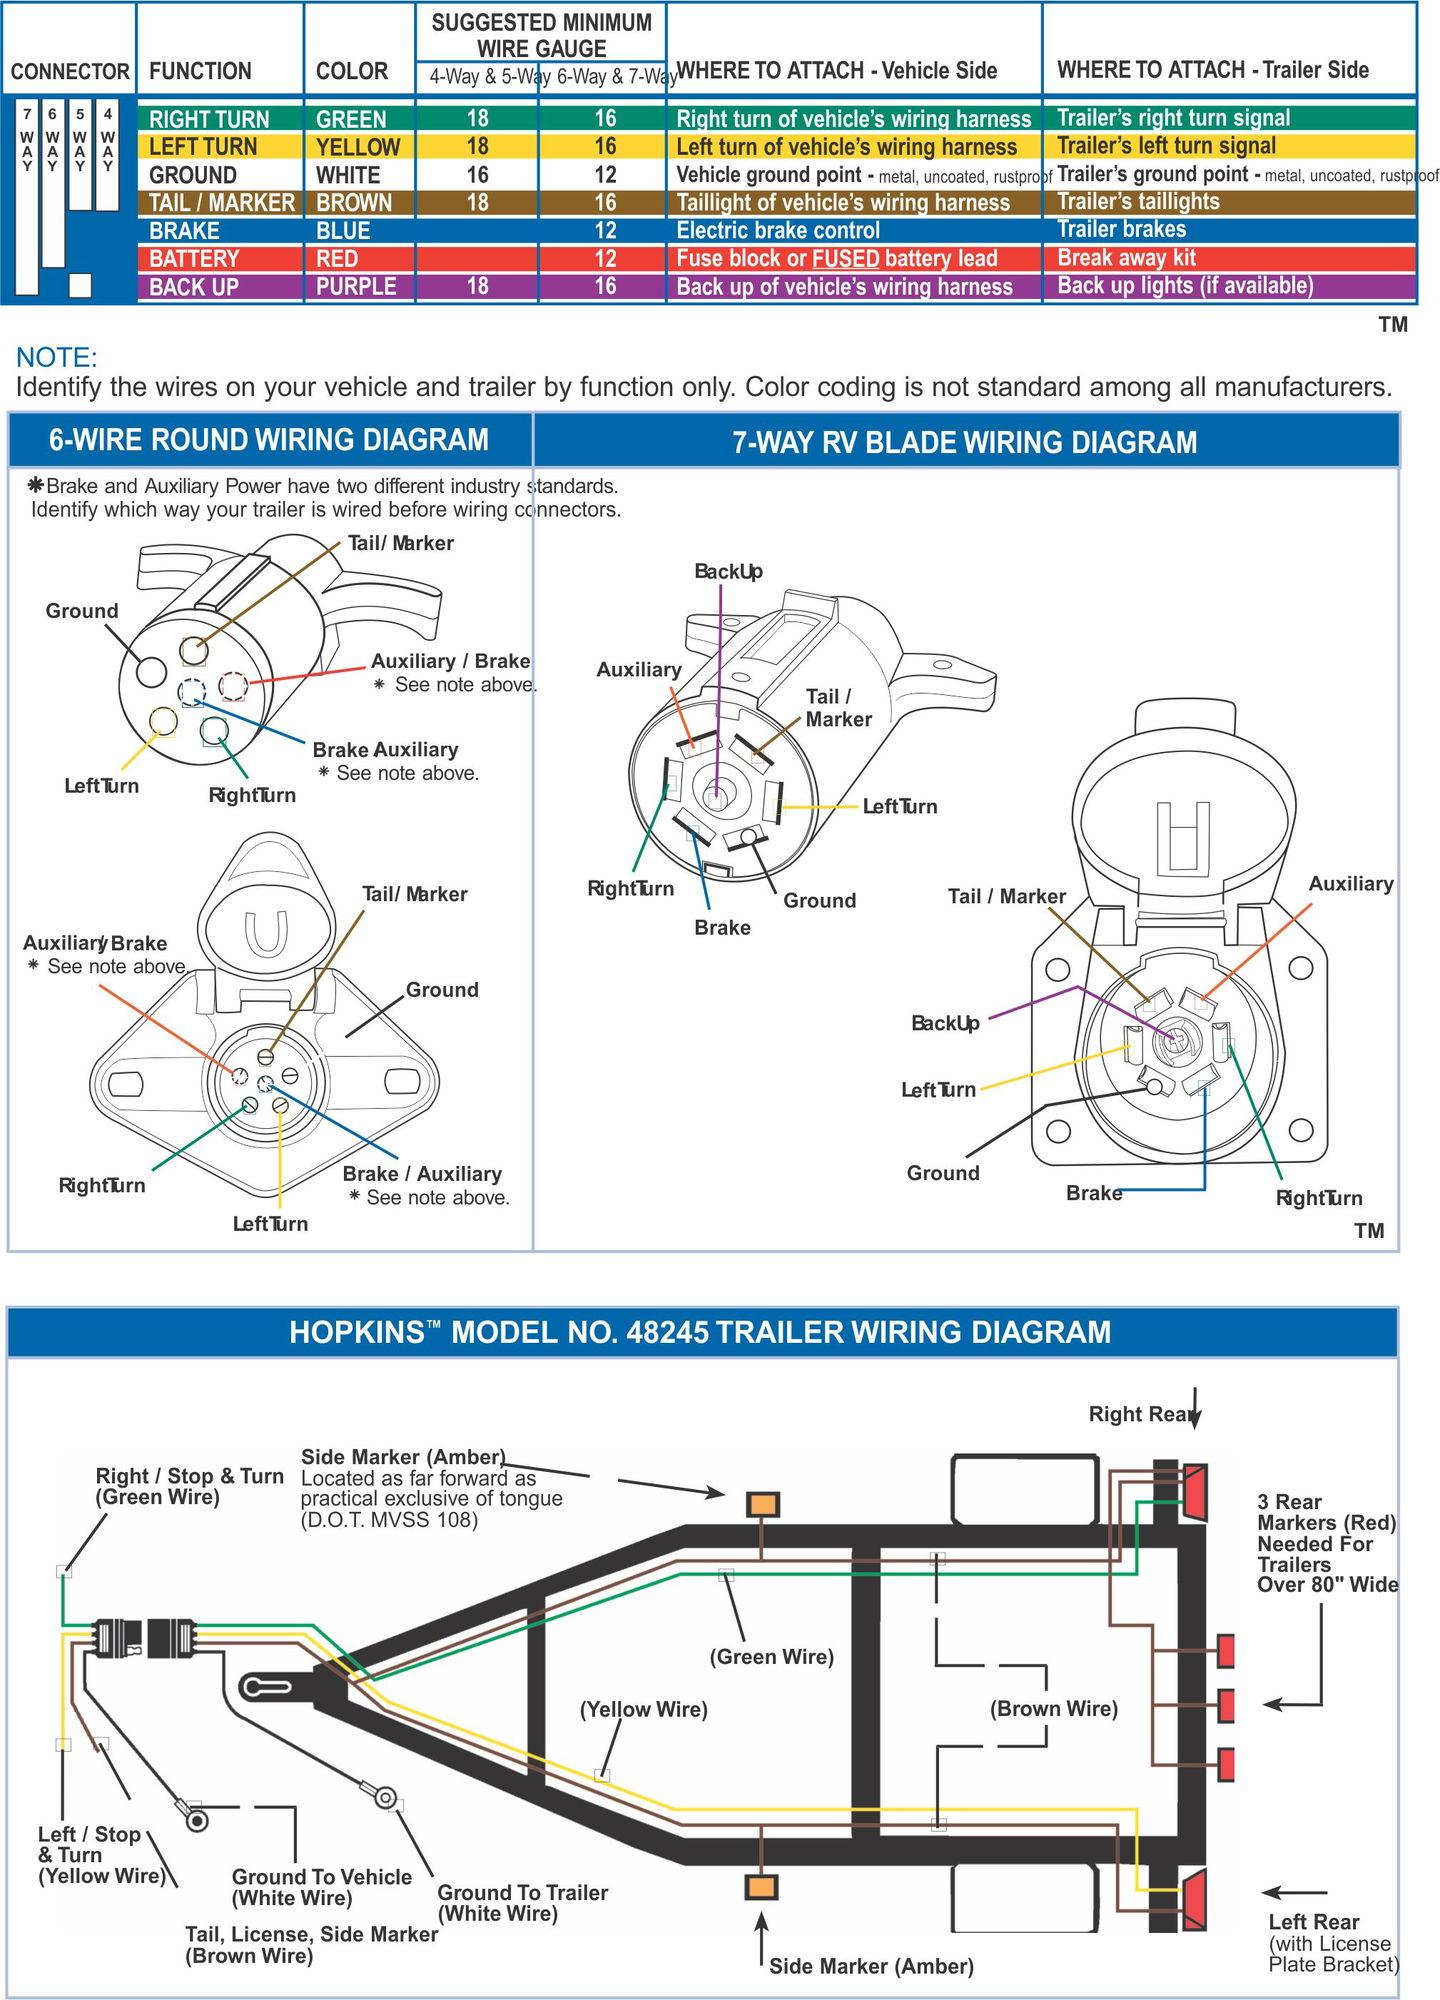 Tail Light Wiring Diagram 1964 Dolphin Gauges Speedometer Diagram – Isuzu Npr Turn Signal Wiring Diagram